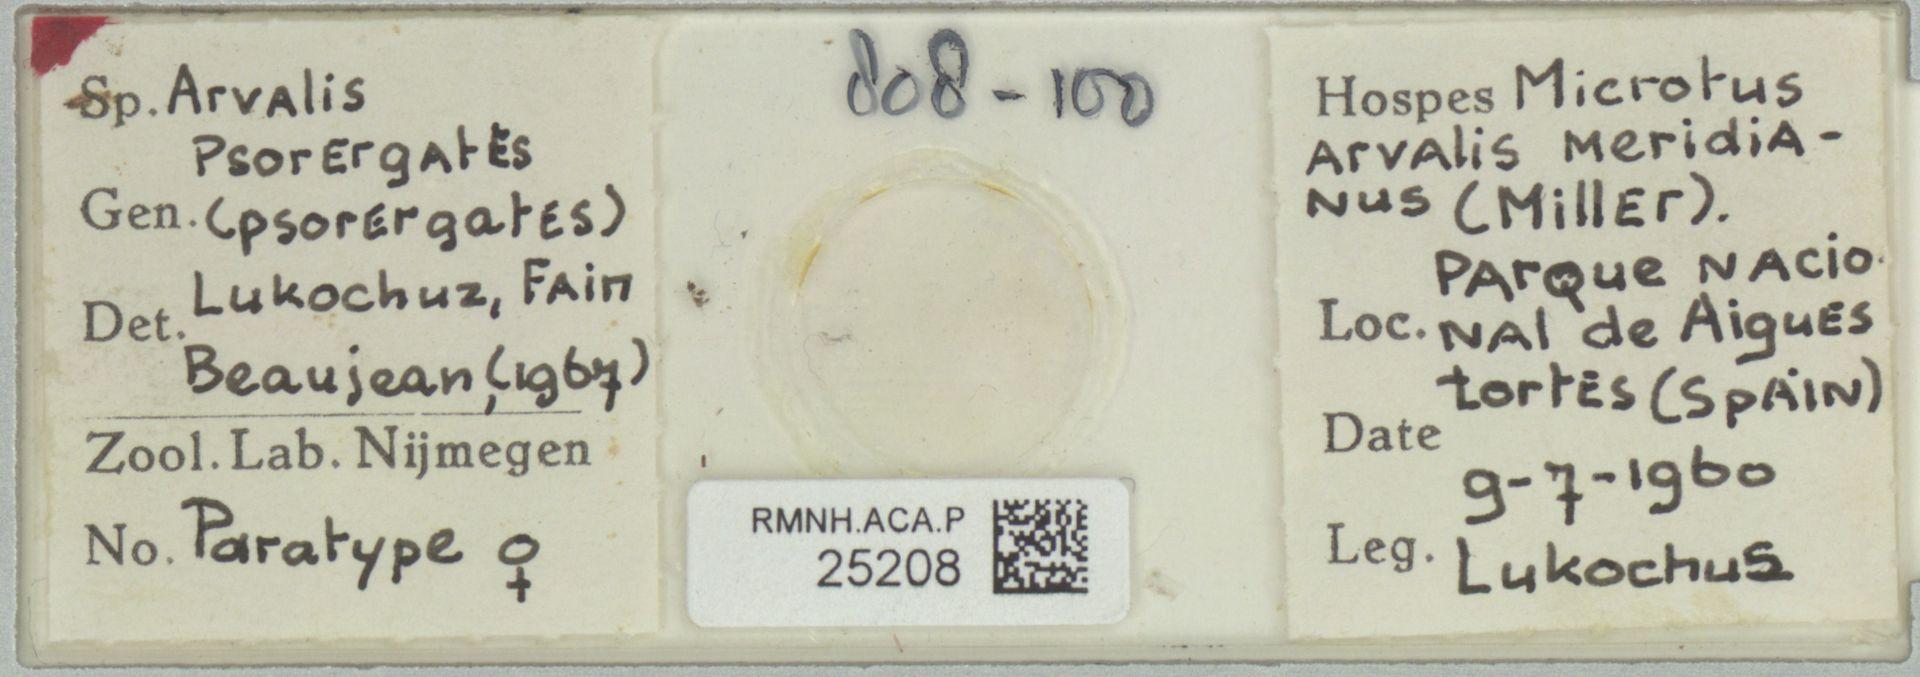 RMNH.ACA.P.25208 | Psorergates Lukochuz, Fain Beaujean (1967)